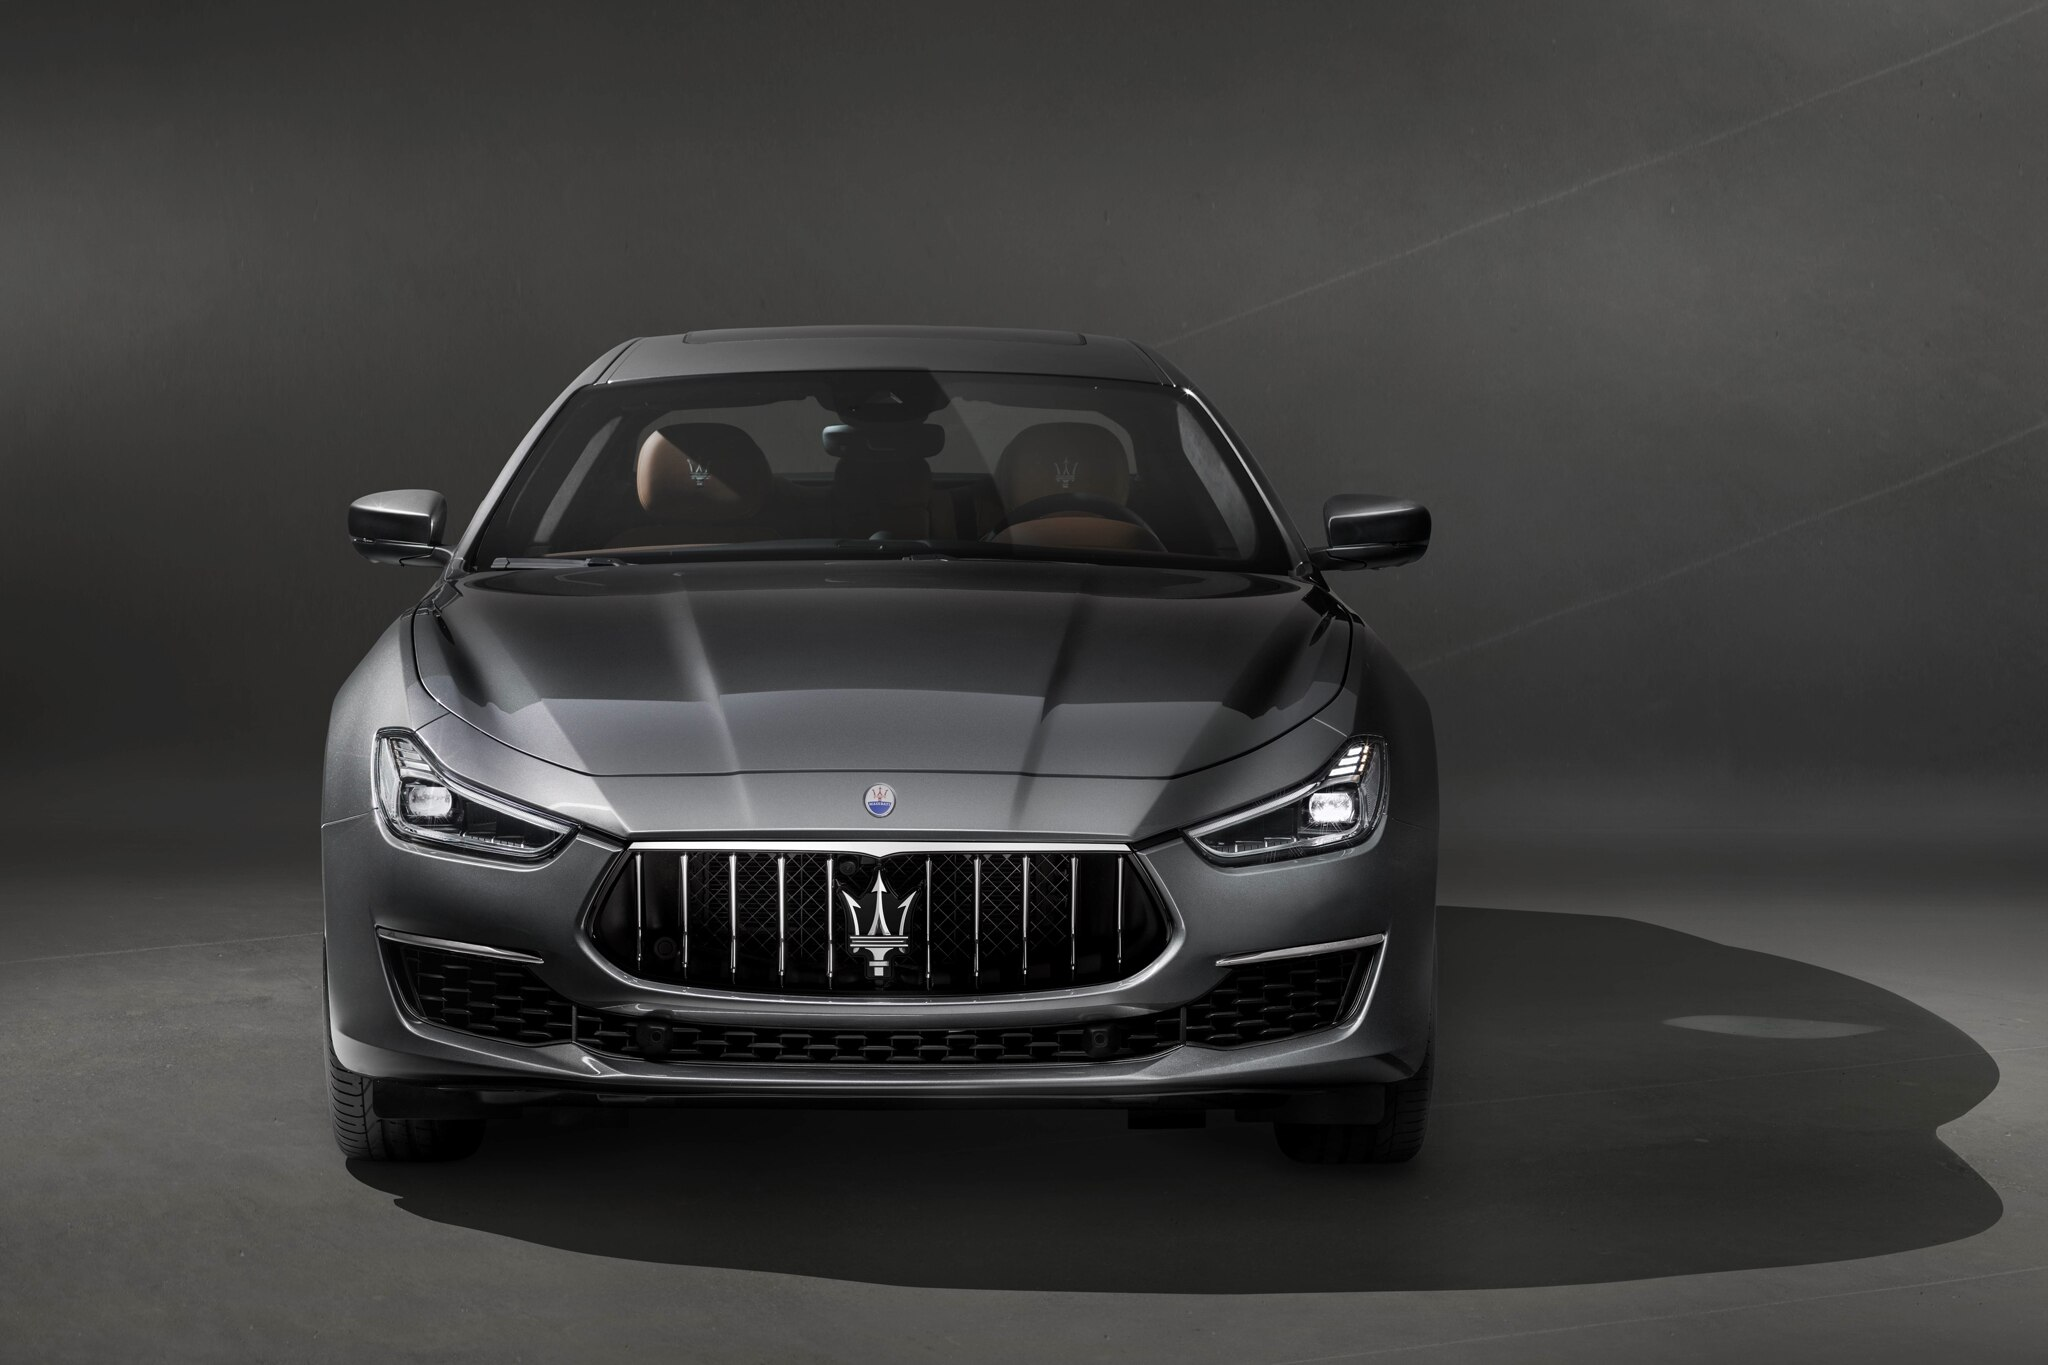 Chengdu 2017: Maserati reveals refreshed Ghibli GranLusso